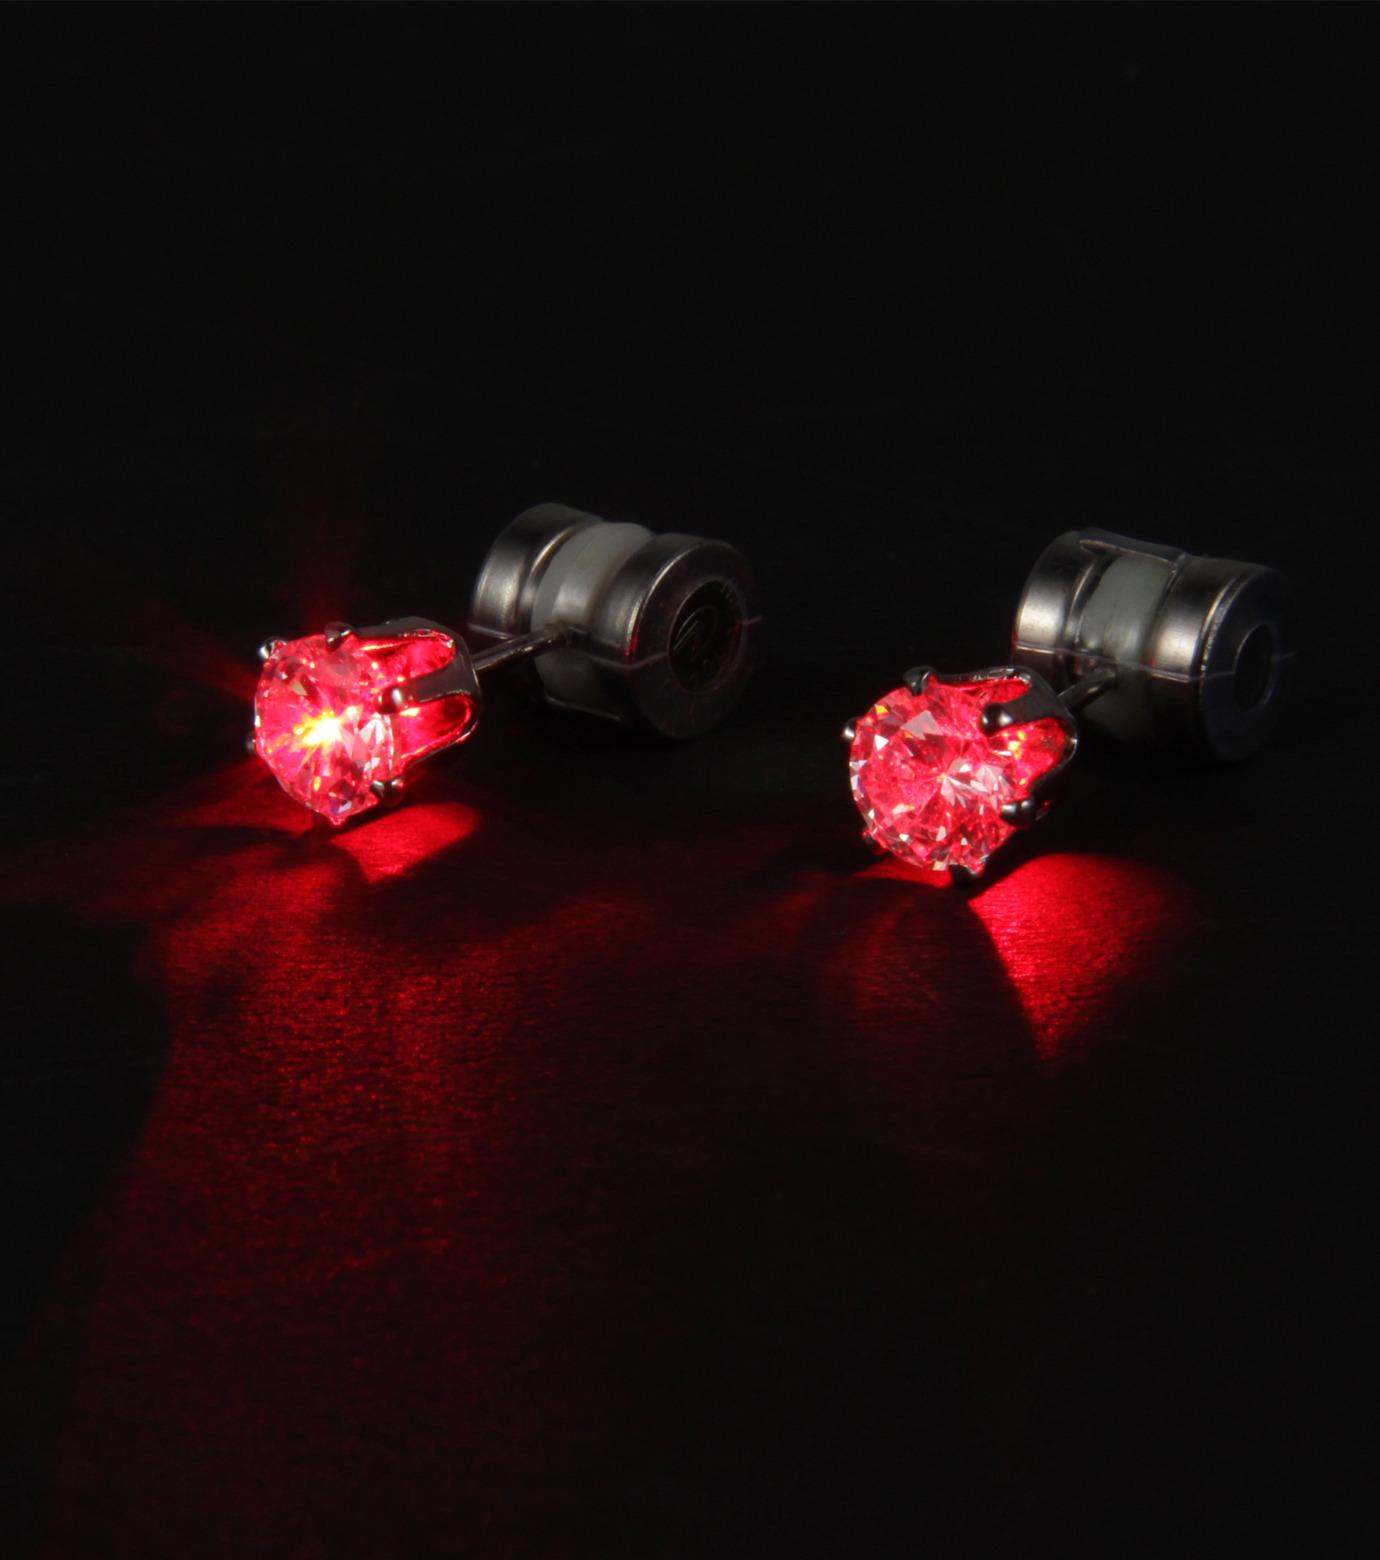 Night Ice(ナイトアイス)のOriginal Red-RED(ガジェット/ライト/gadgets/light)-Original-62 拡大詳細画像2